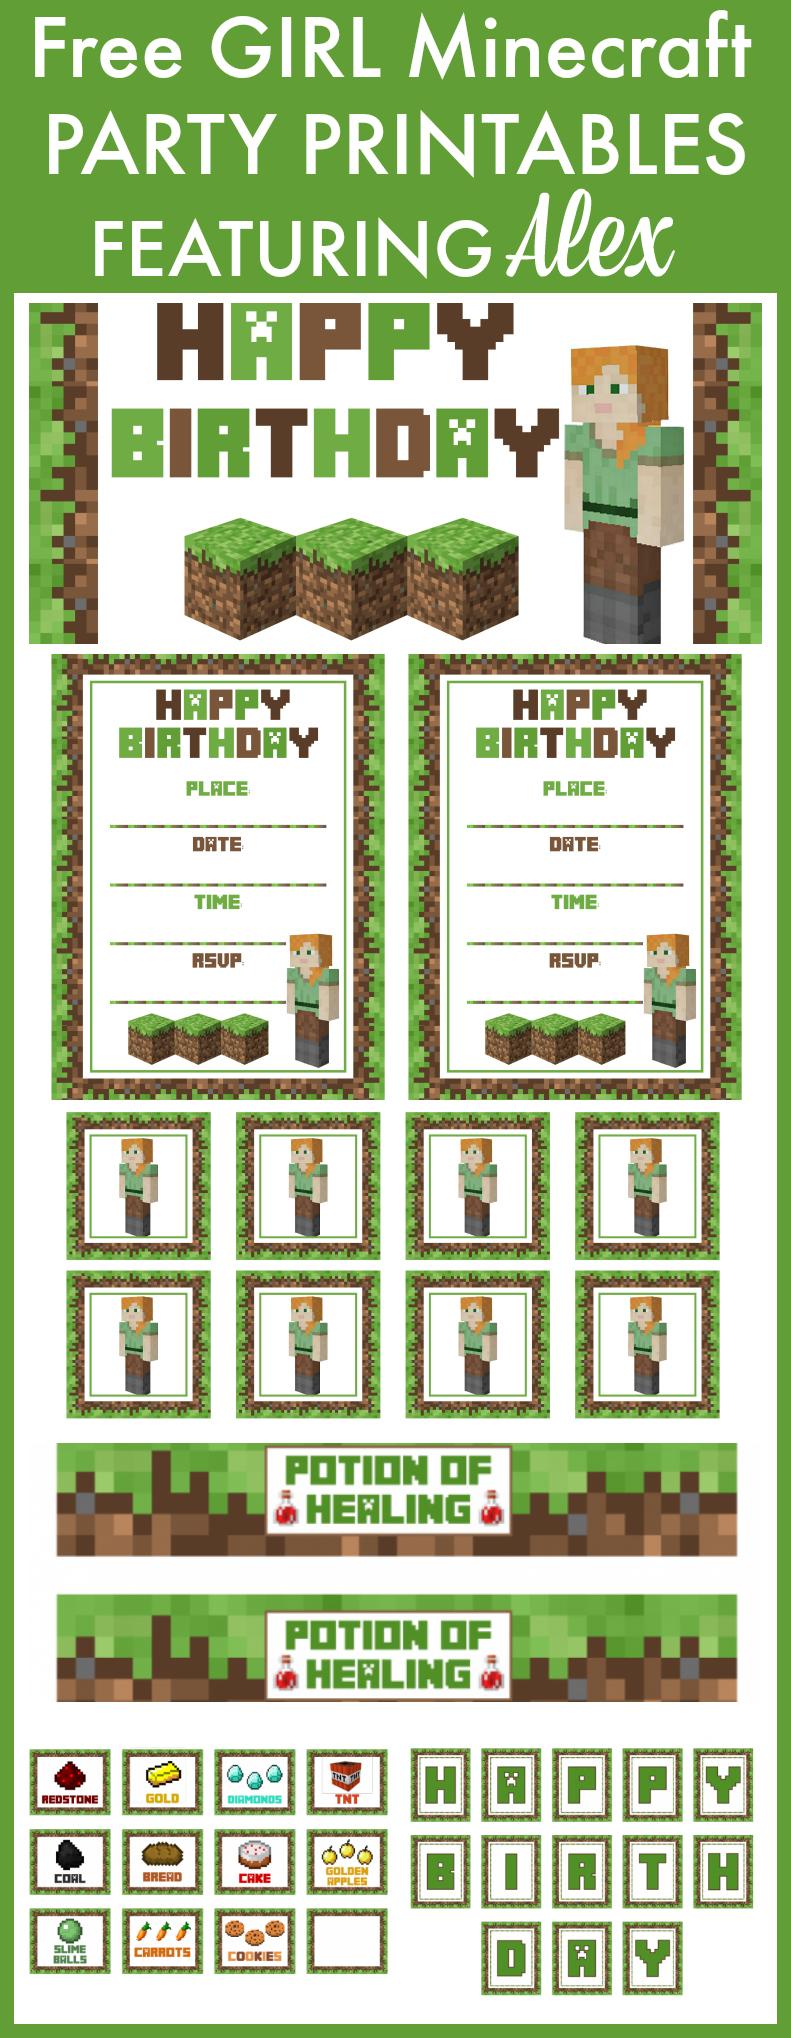 Free Printable Minecraft Girls